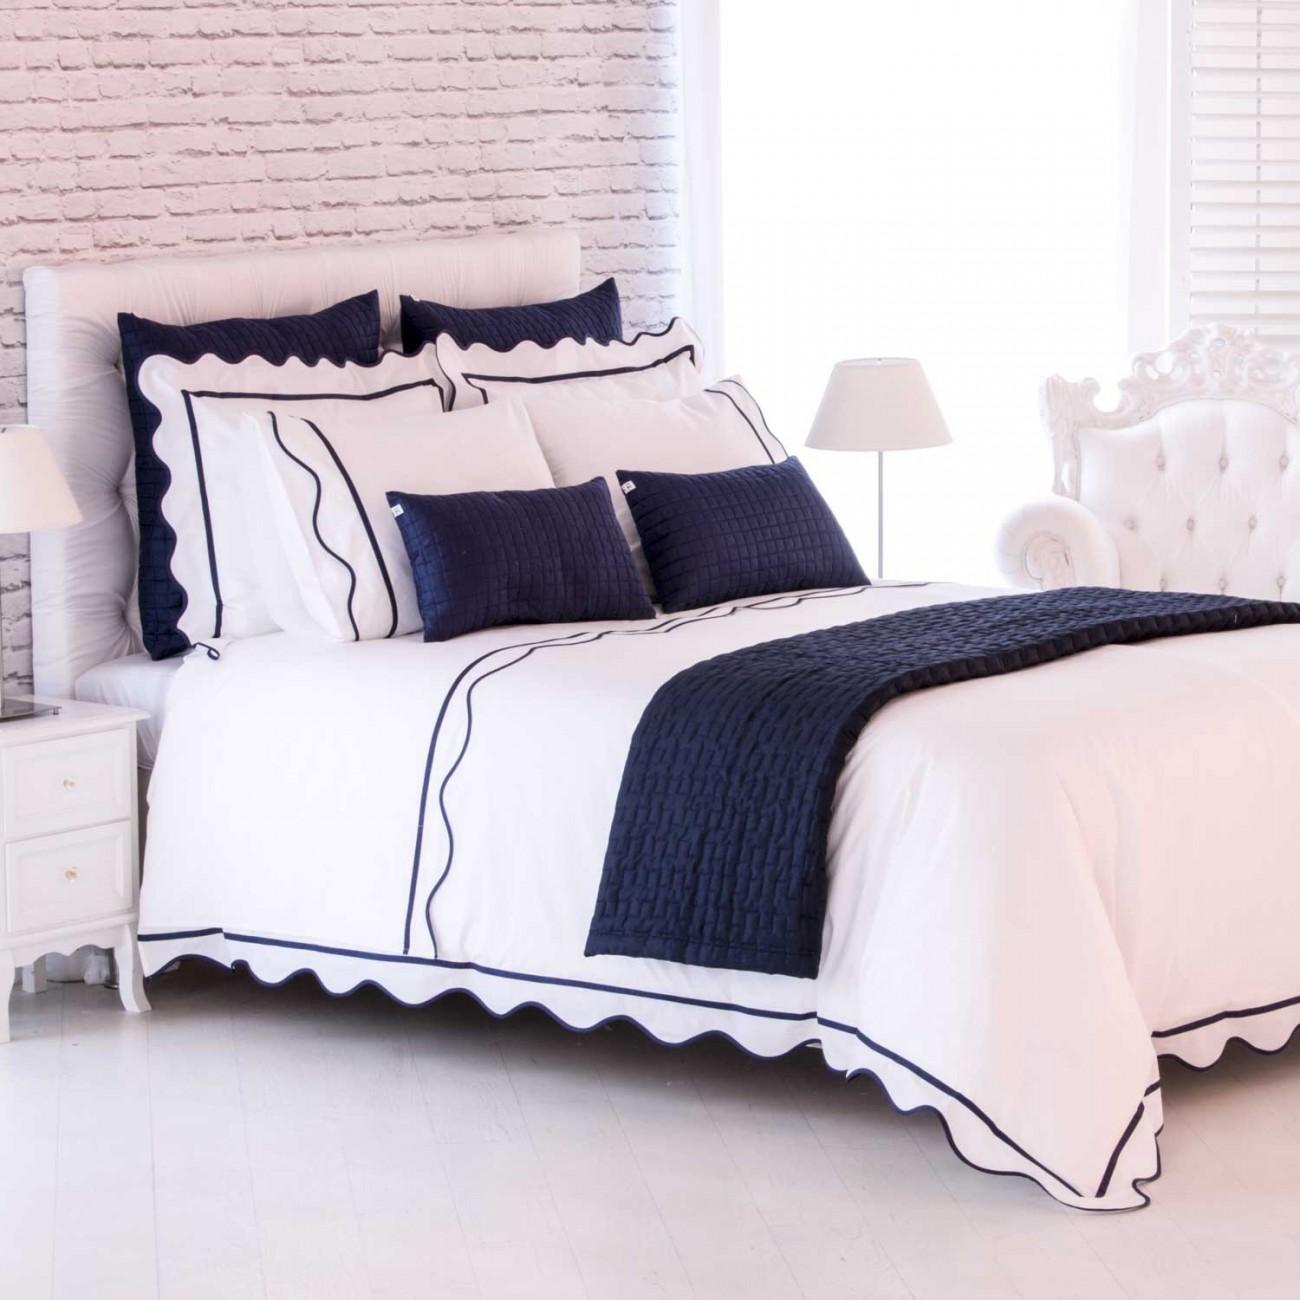 Nana' Bed Linen Collection